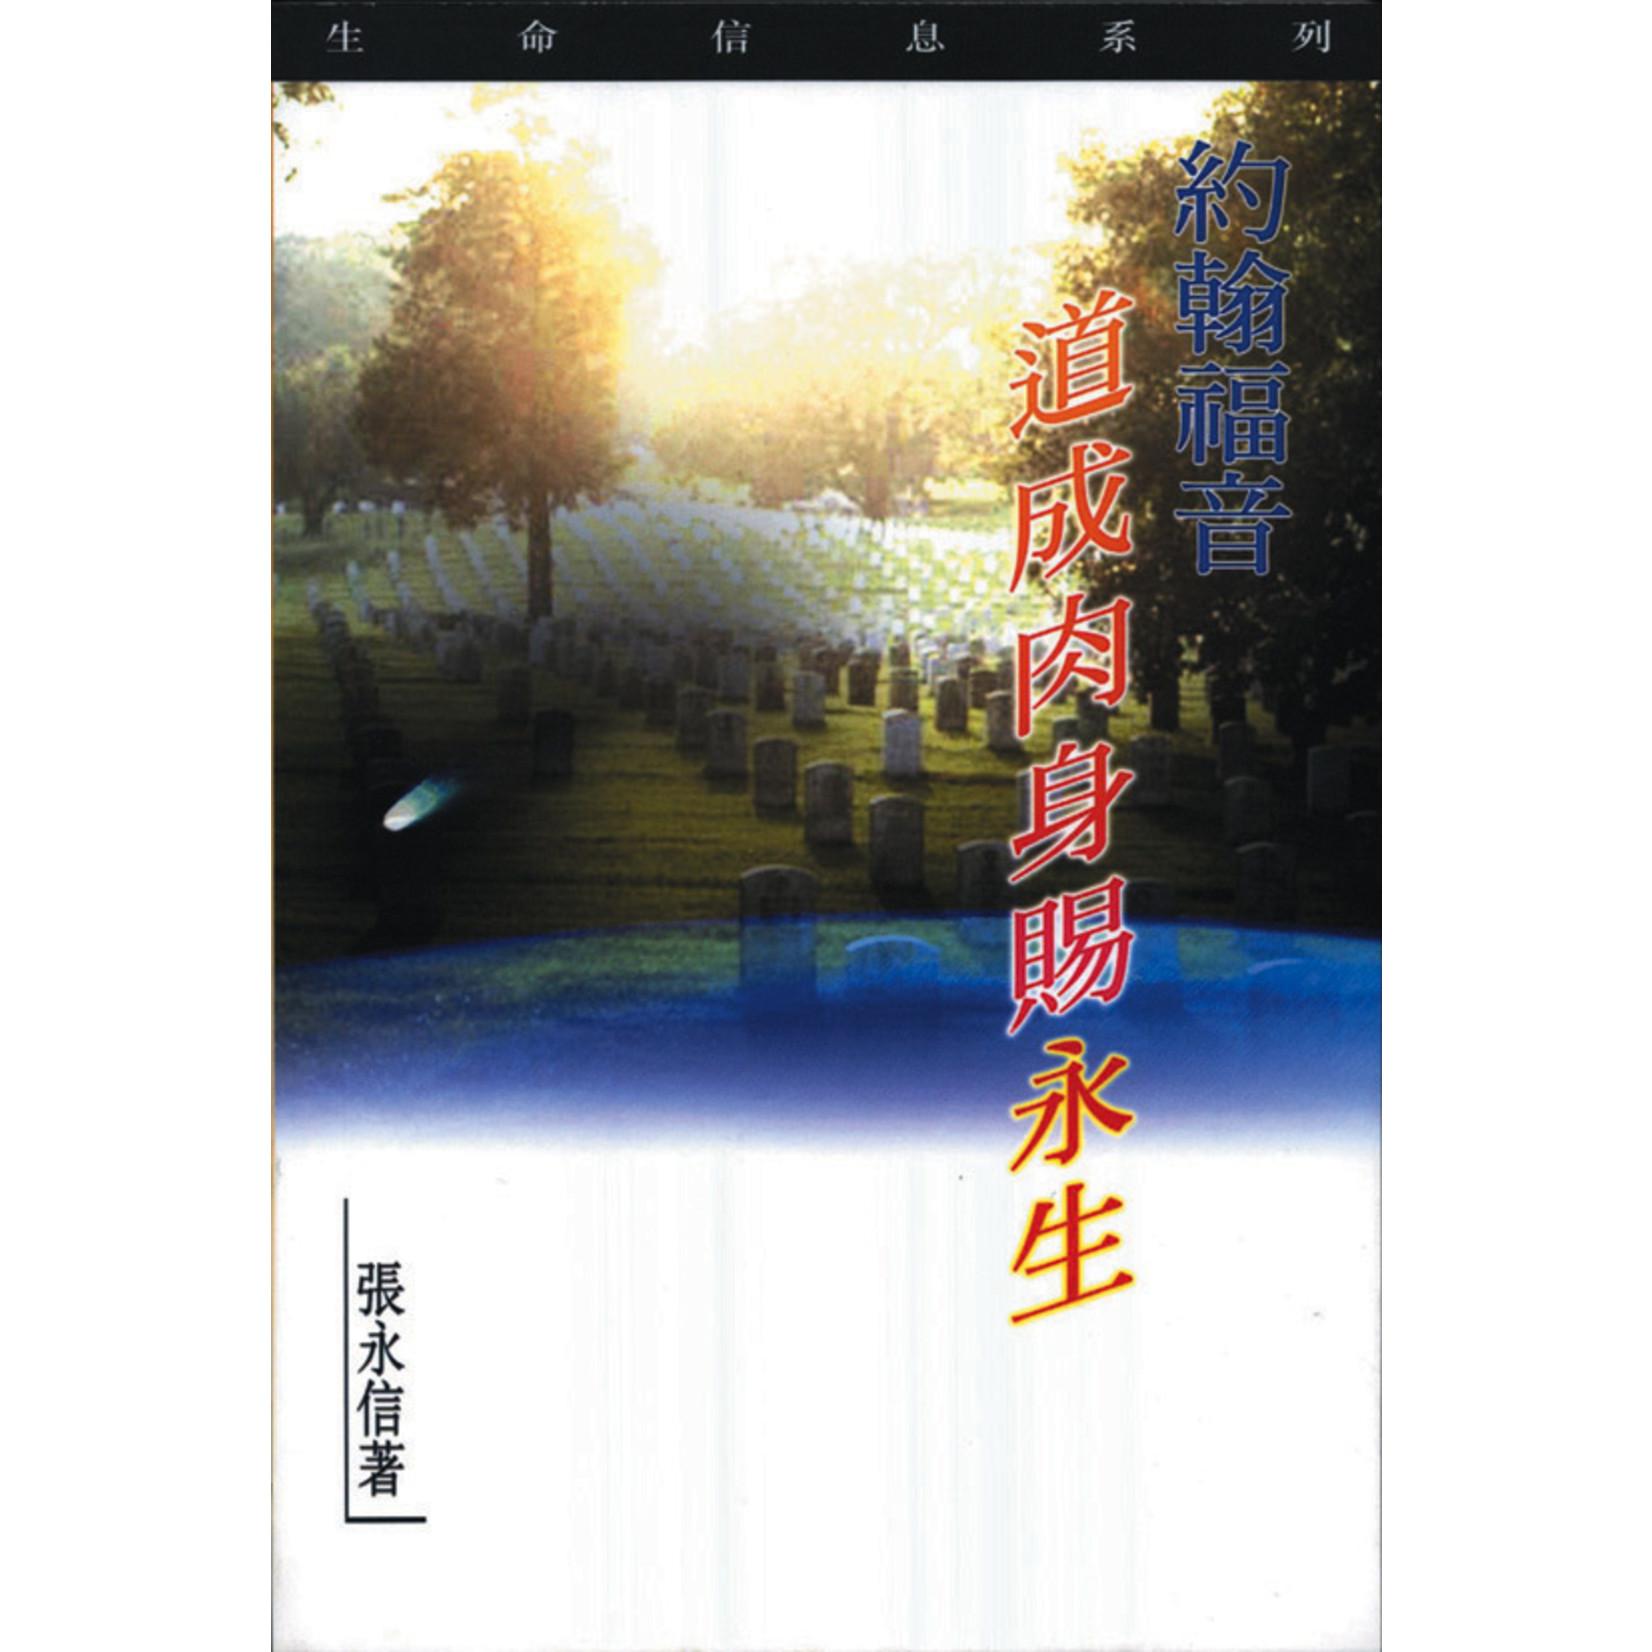 天道書樓 Tien Dao Publishing House 約翰福音:道成肉身賜永生